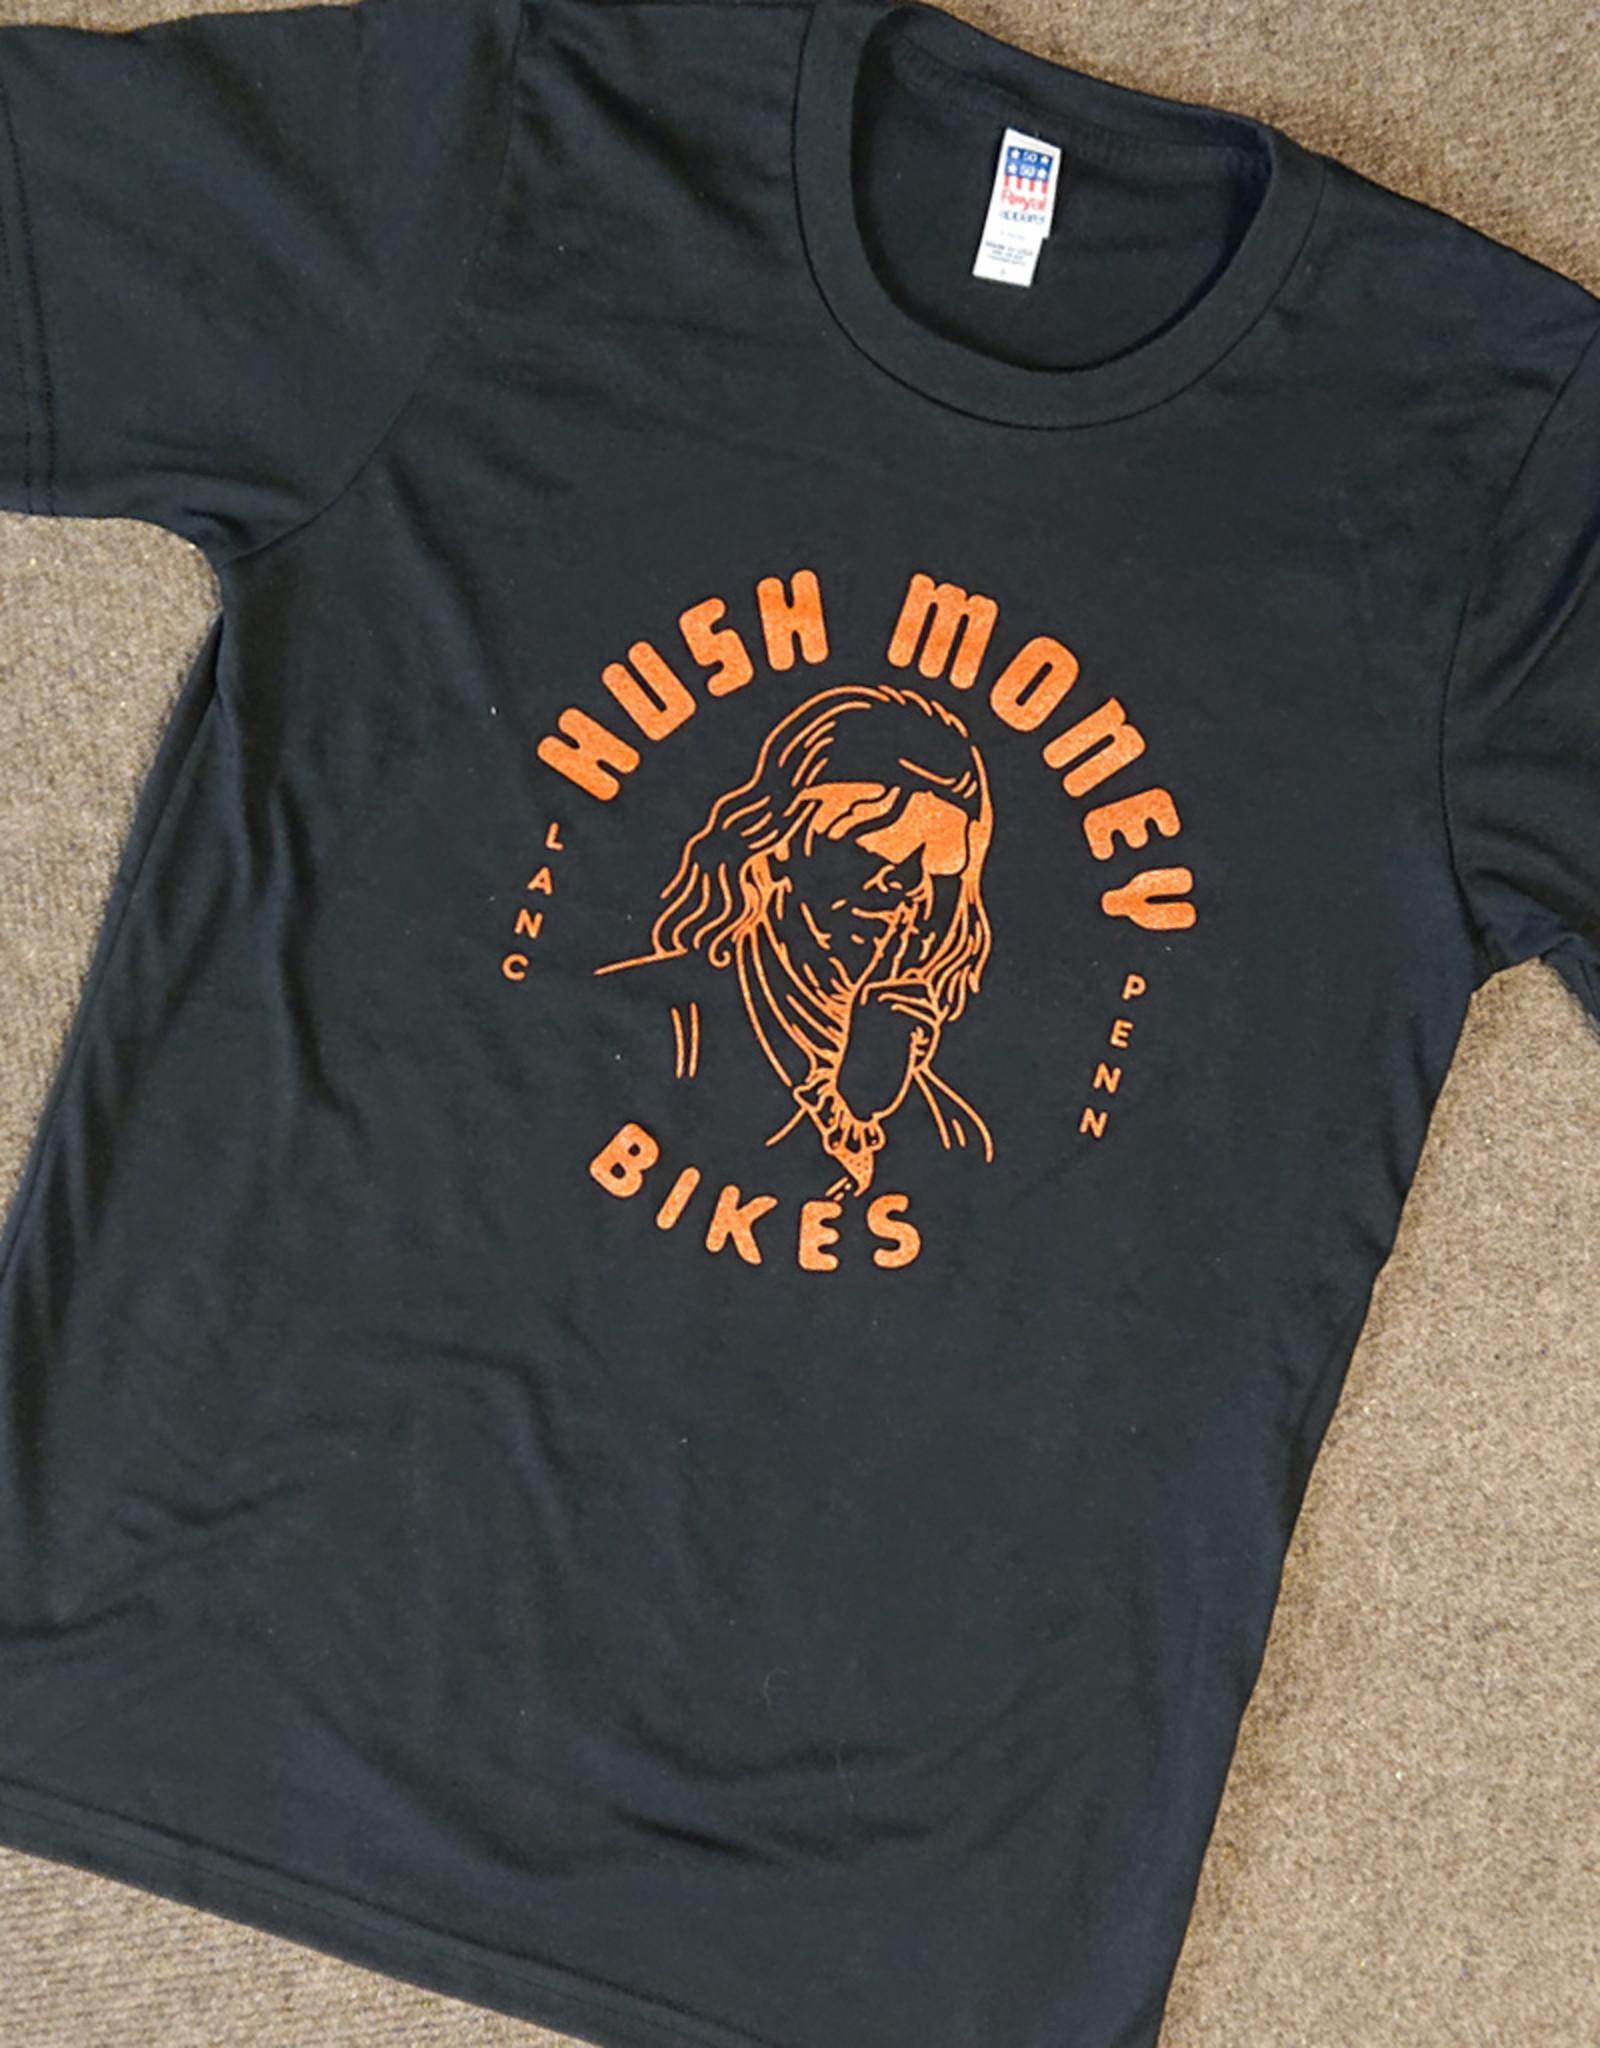 Hush Money Bikes Hush Money Ben Cranklin T-Shirt Flyerdelphia Unisex